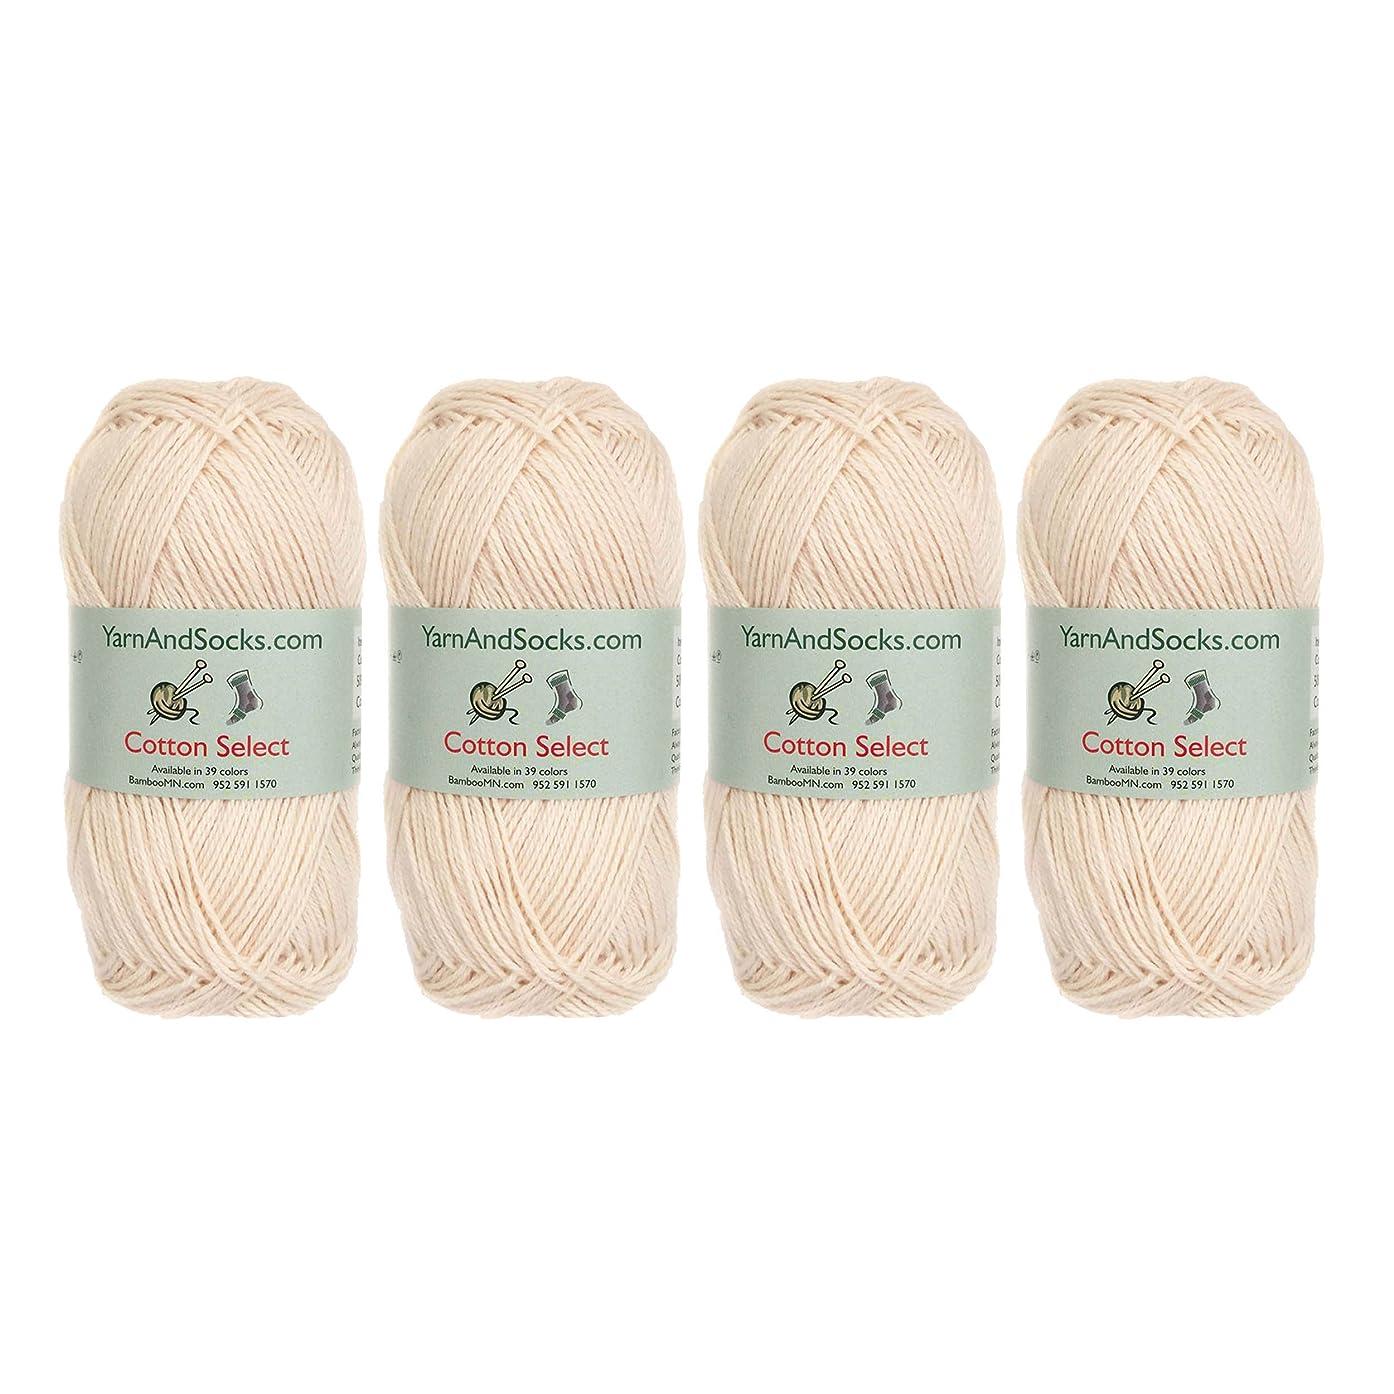 Cotton Select Sport Weight Yarn - 100% Fine Cotton - 4 Skeins - Col 403 - Moon Beam